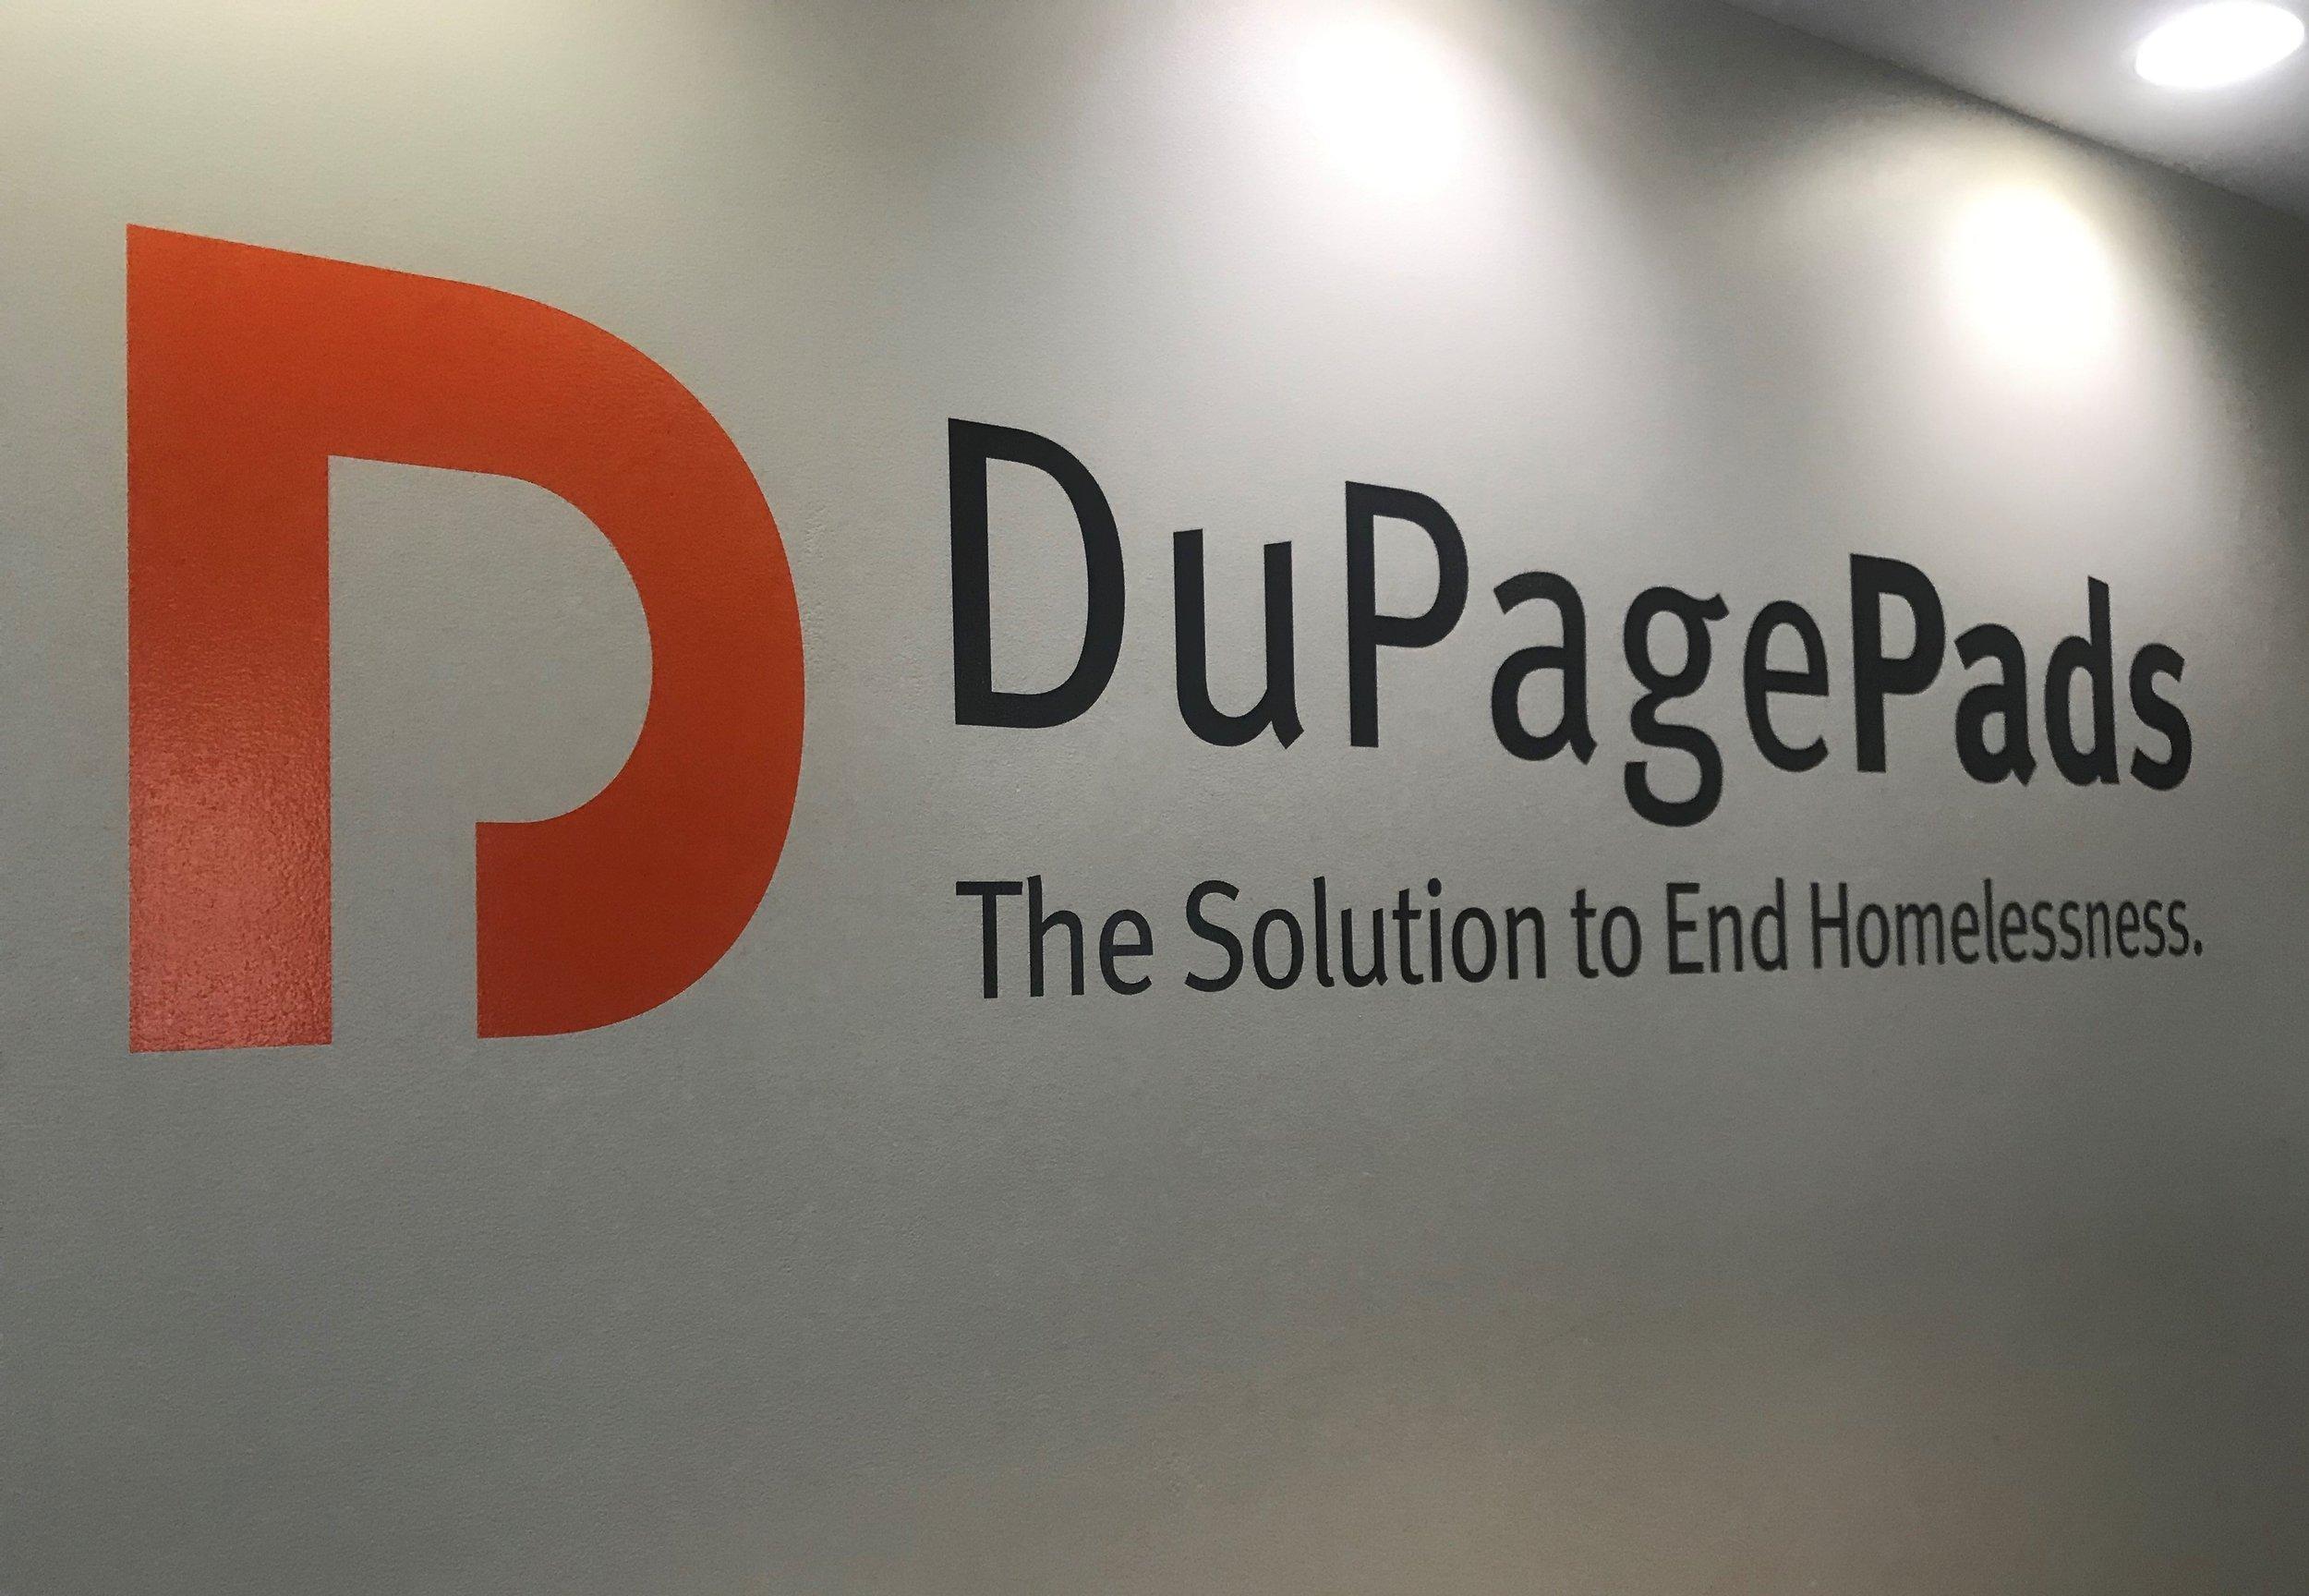 DuPage_PADS.jpg